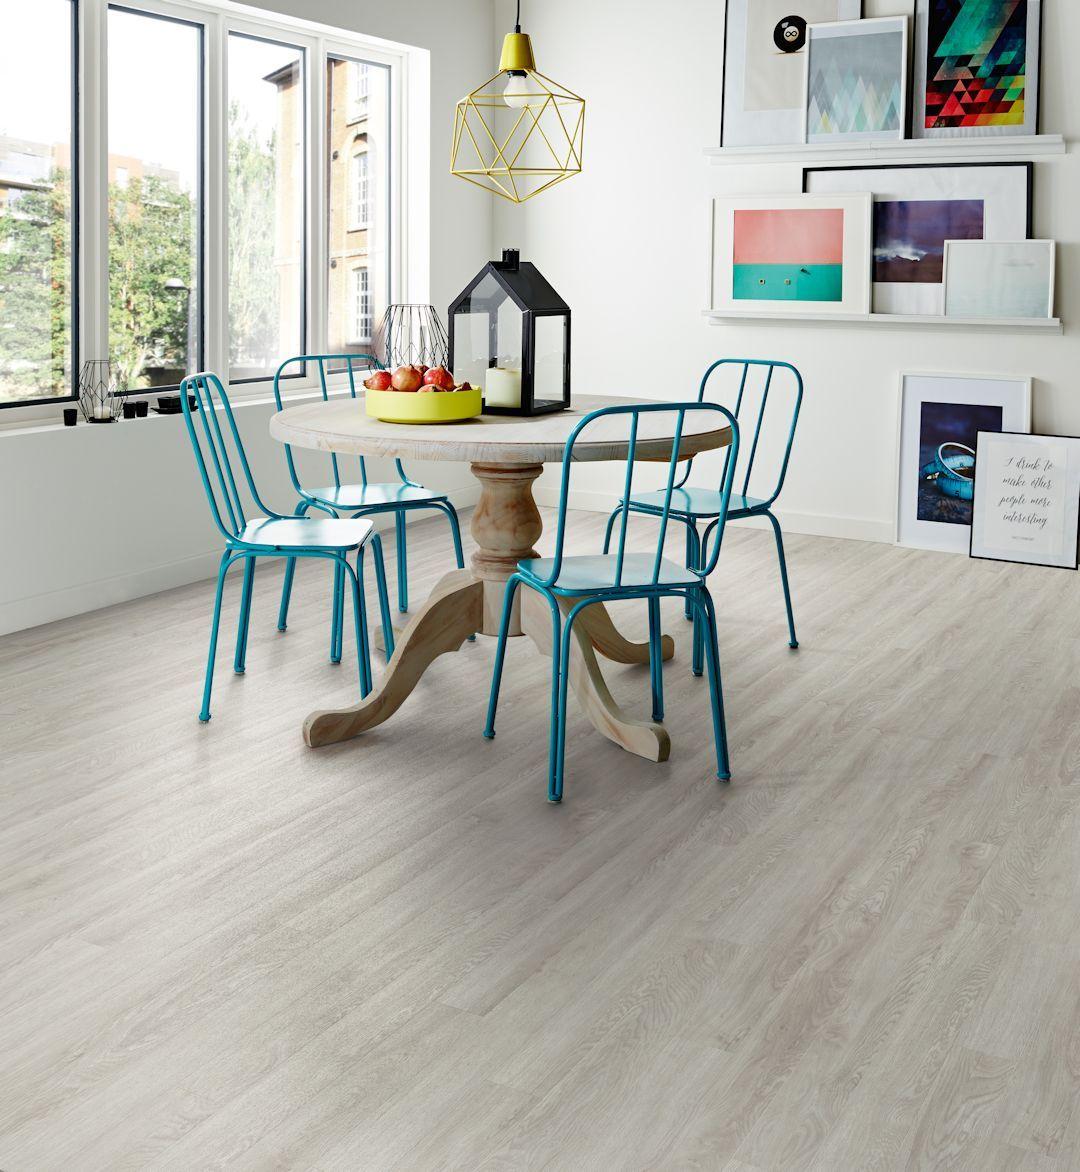 Bianco Oak Camaro Luxury Vinyl Tile Flooring Featured In Dining Room